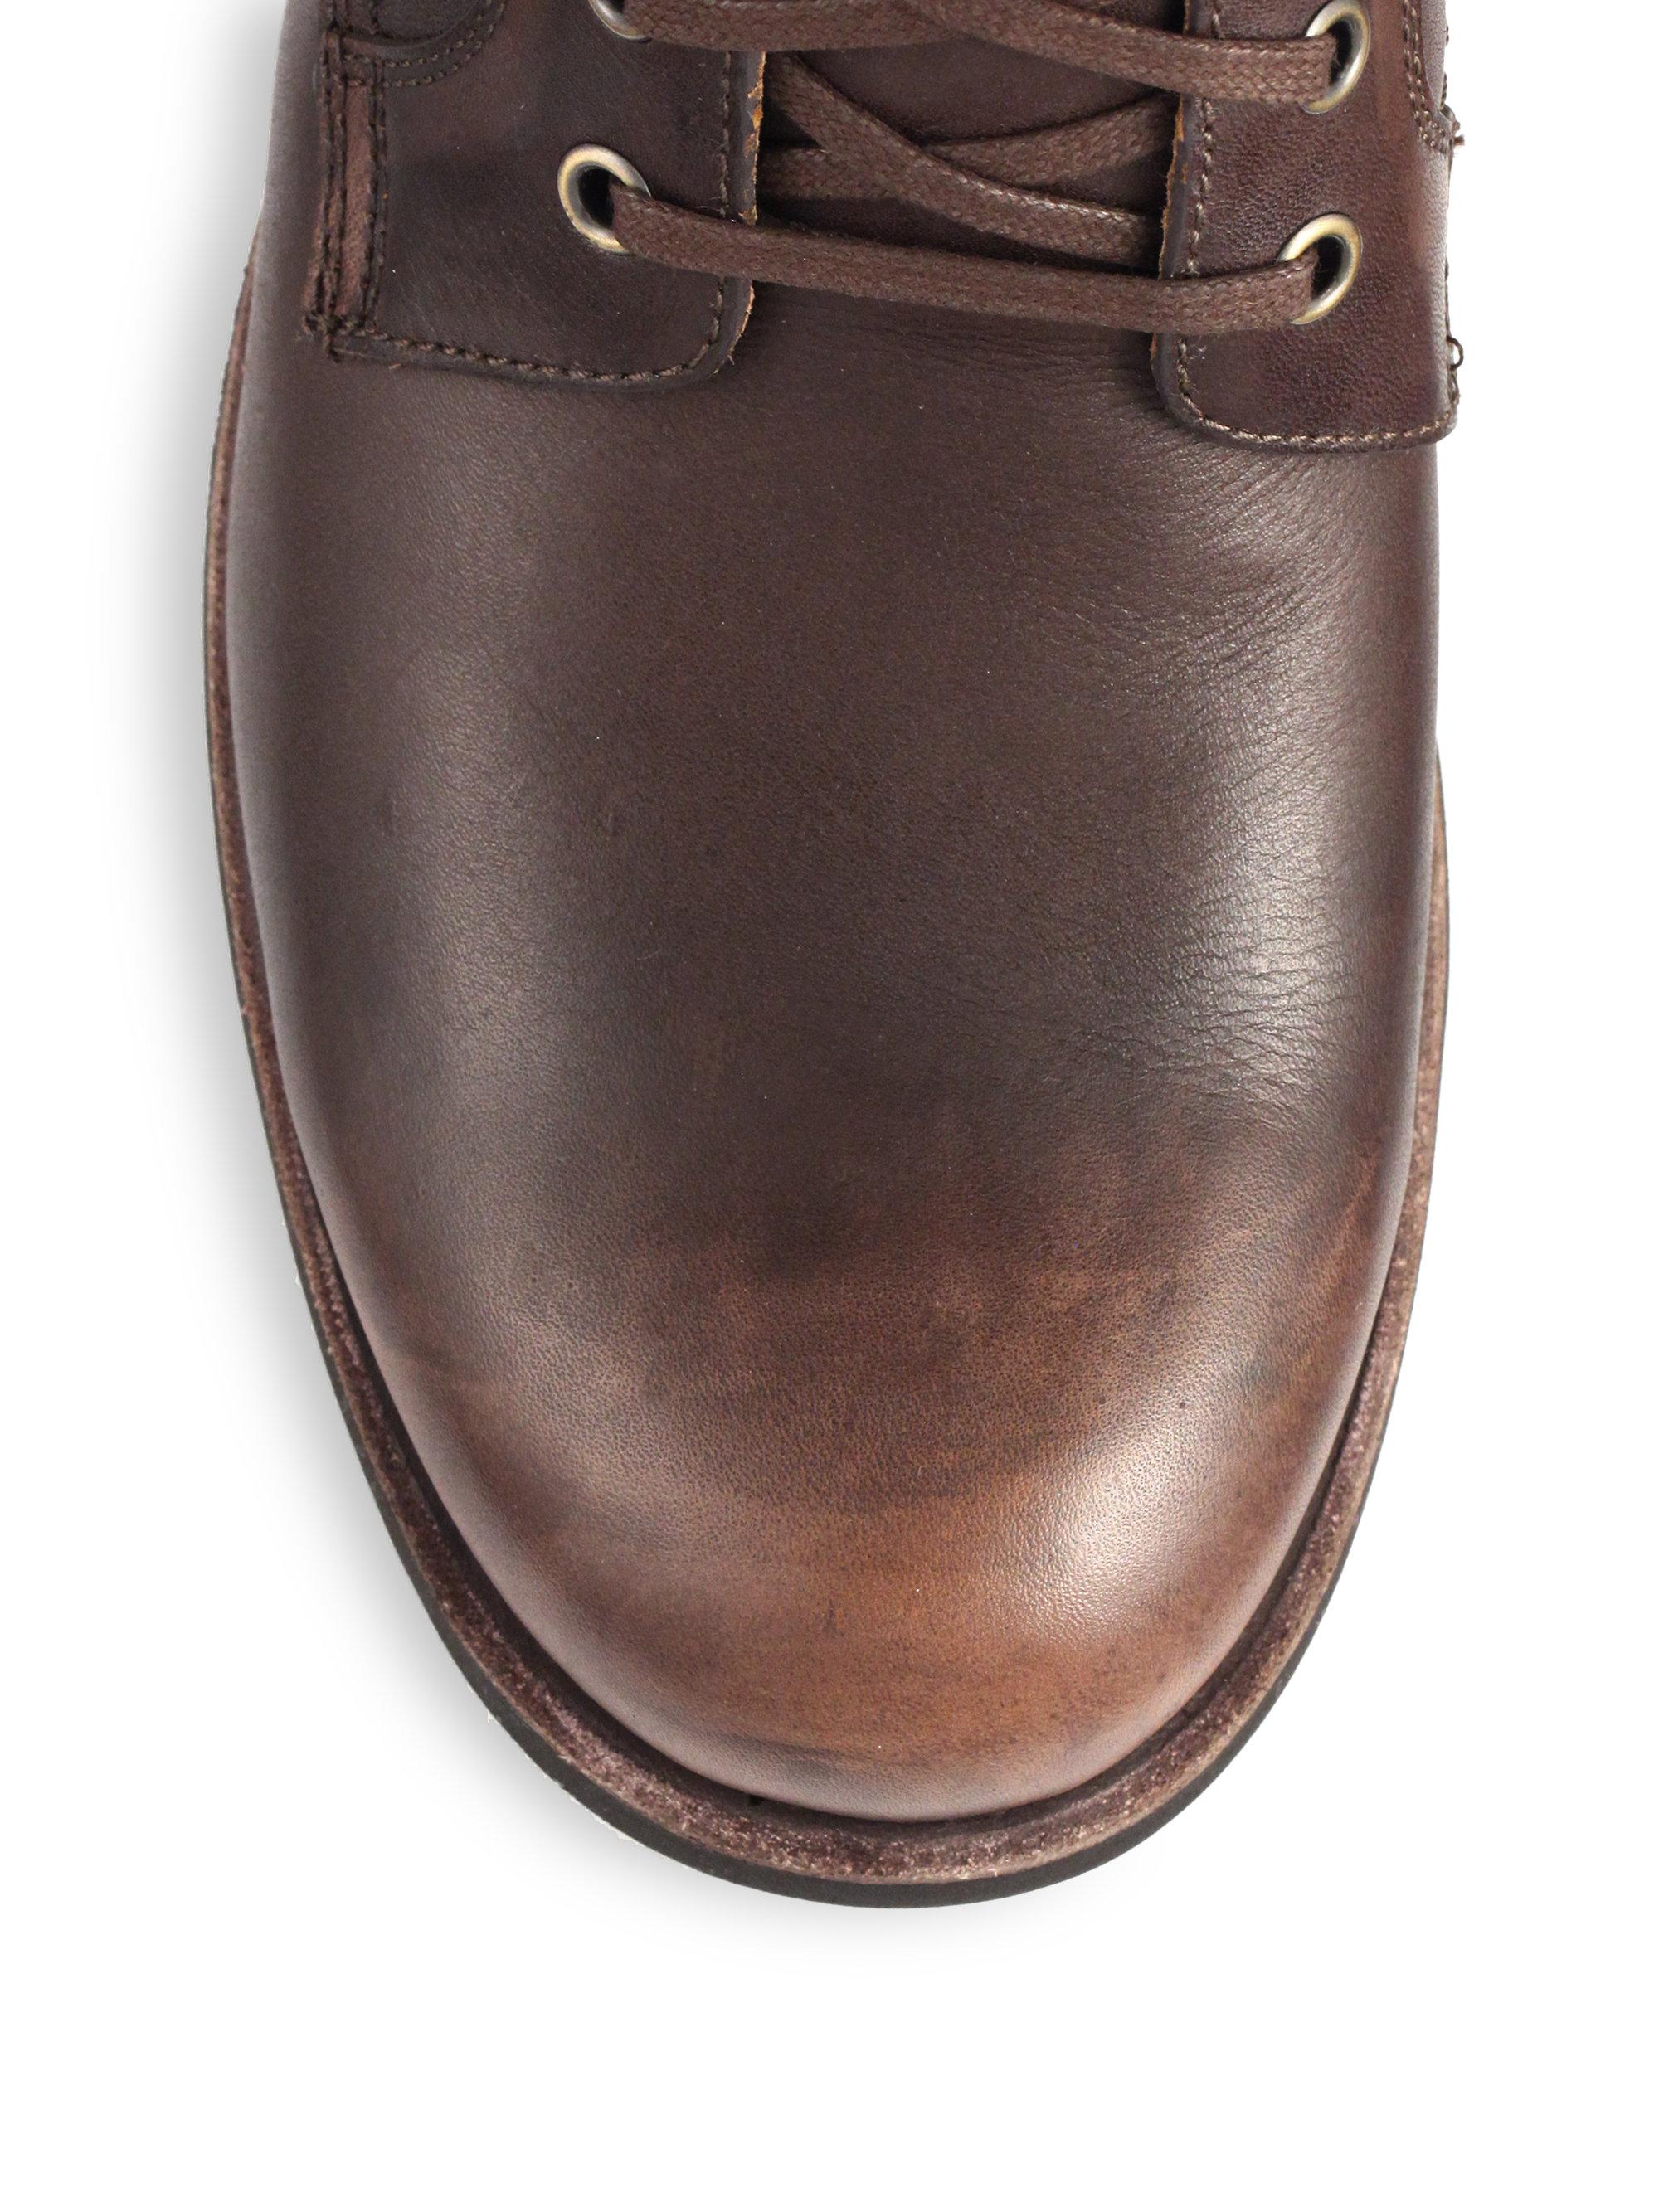 29ea9261697 Men S Ugg Australia Black Larus Boots - Best Picture Of Boot Imageco.Org